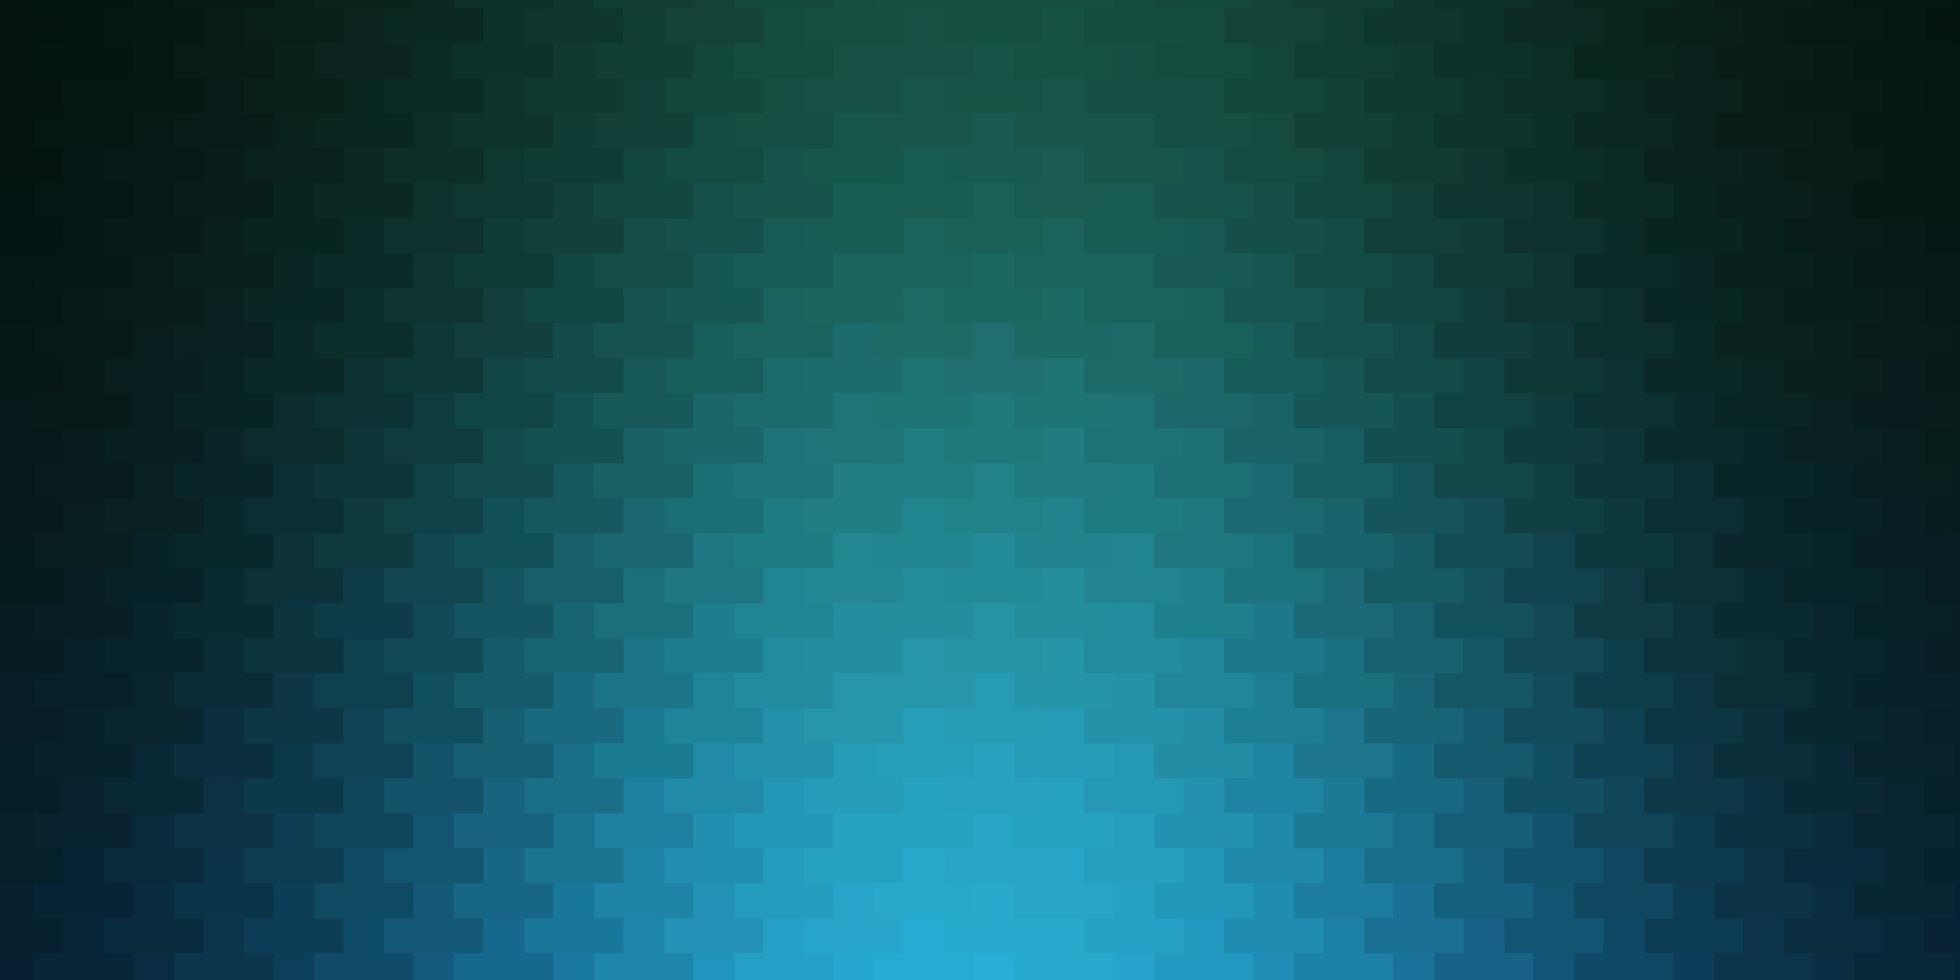 fond de vecteur bleu clair, vert avec des rectangles.